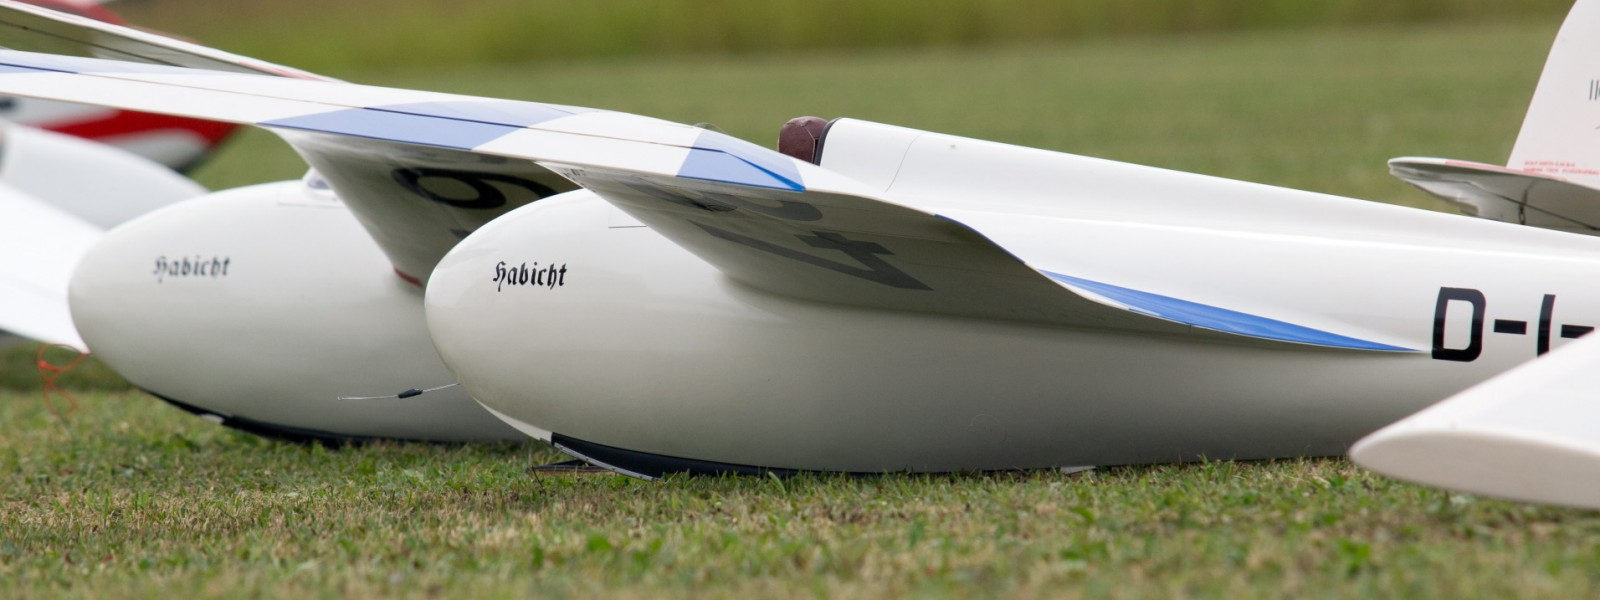 IGG Aerotow Kuivanto 8.-10.8.2014